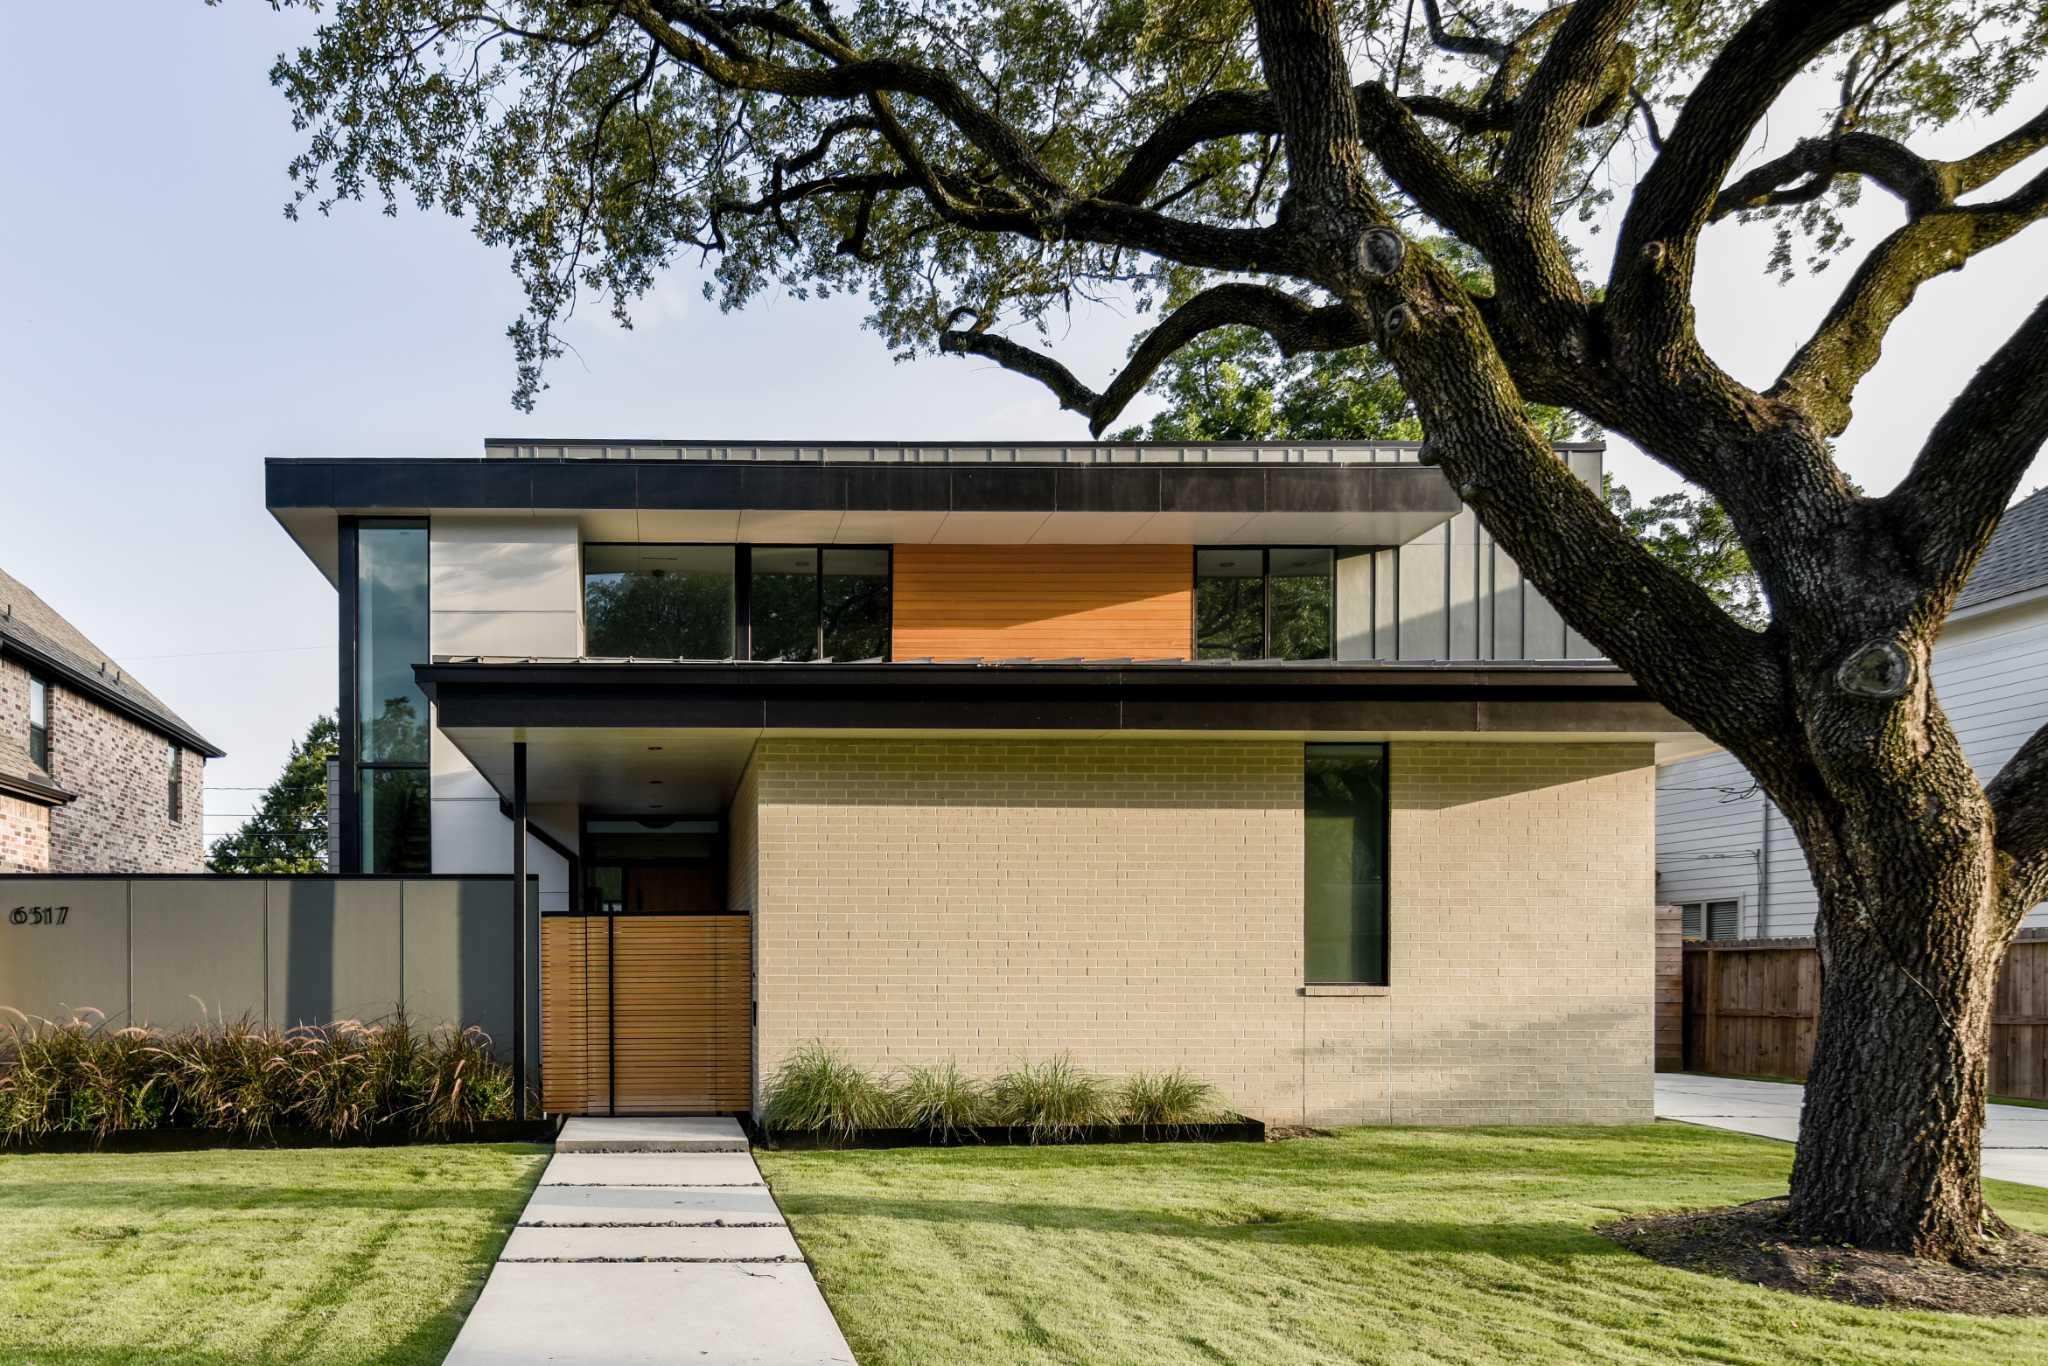 Modern meets hindu design principles in spring branch home